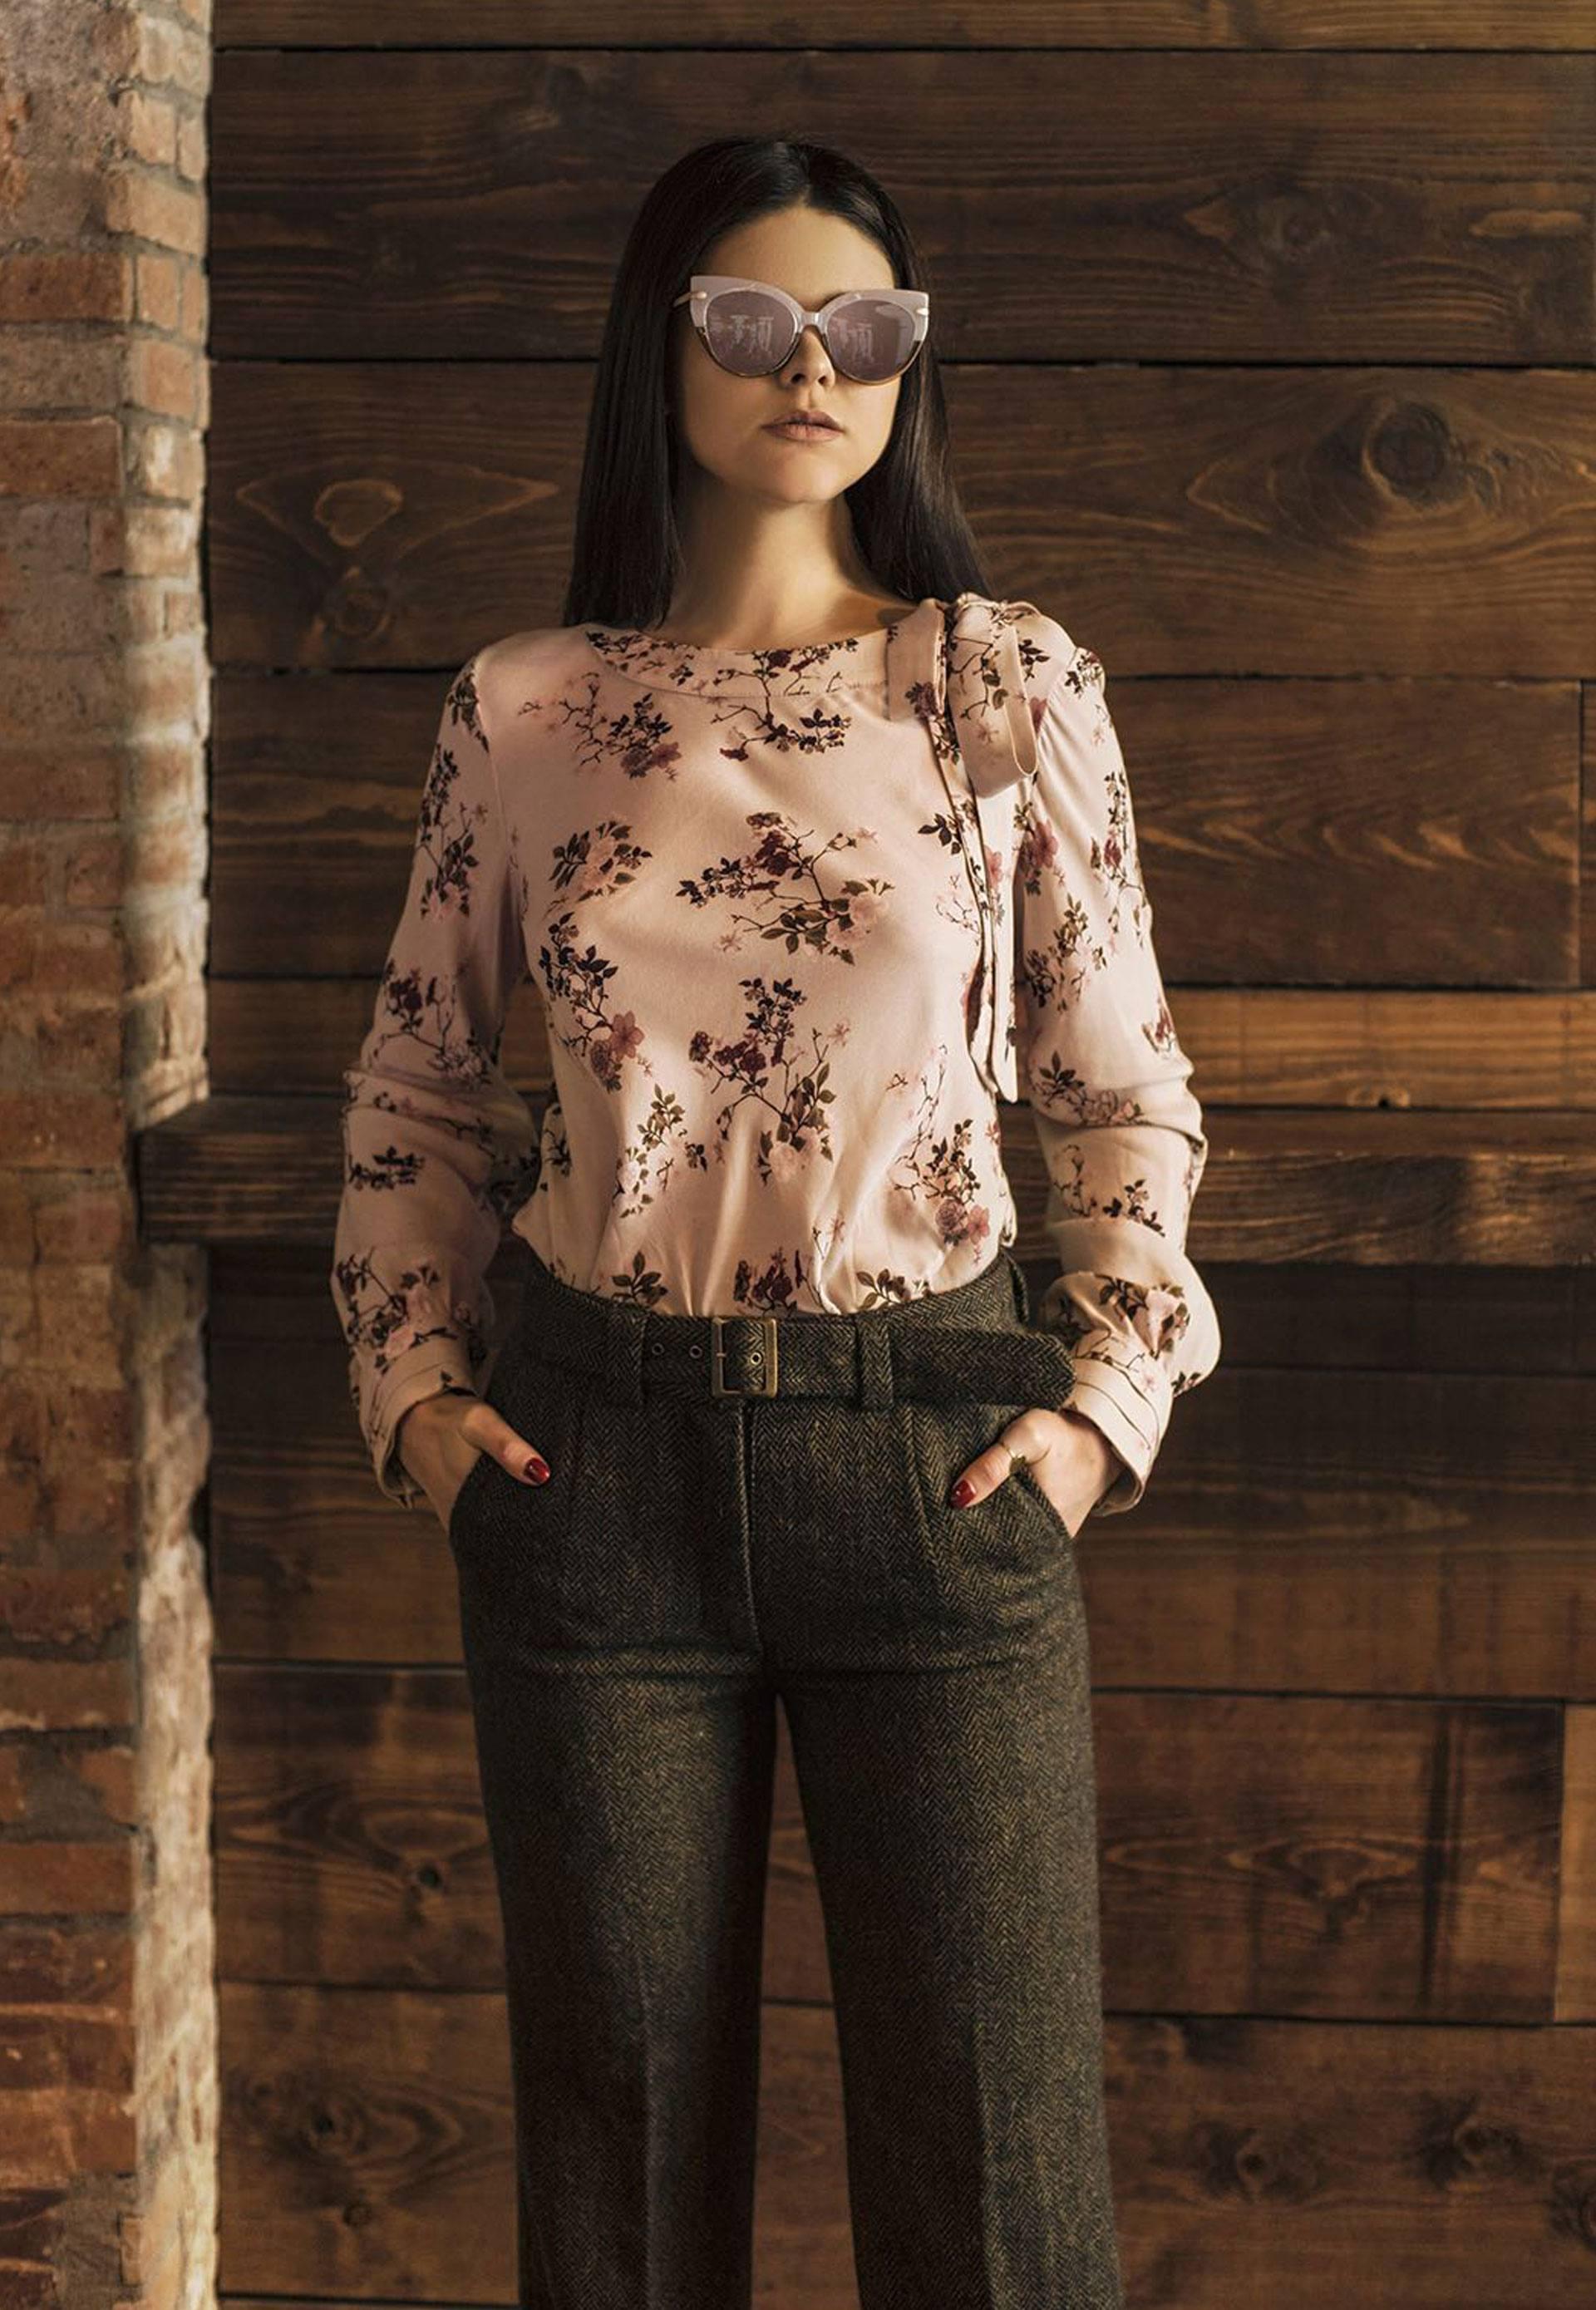 PRÊT À PORTER-FALL WINTER 19/20 - TOPS, BLUSAS - Blusa print floral rosa empolvado